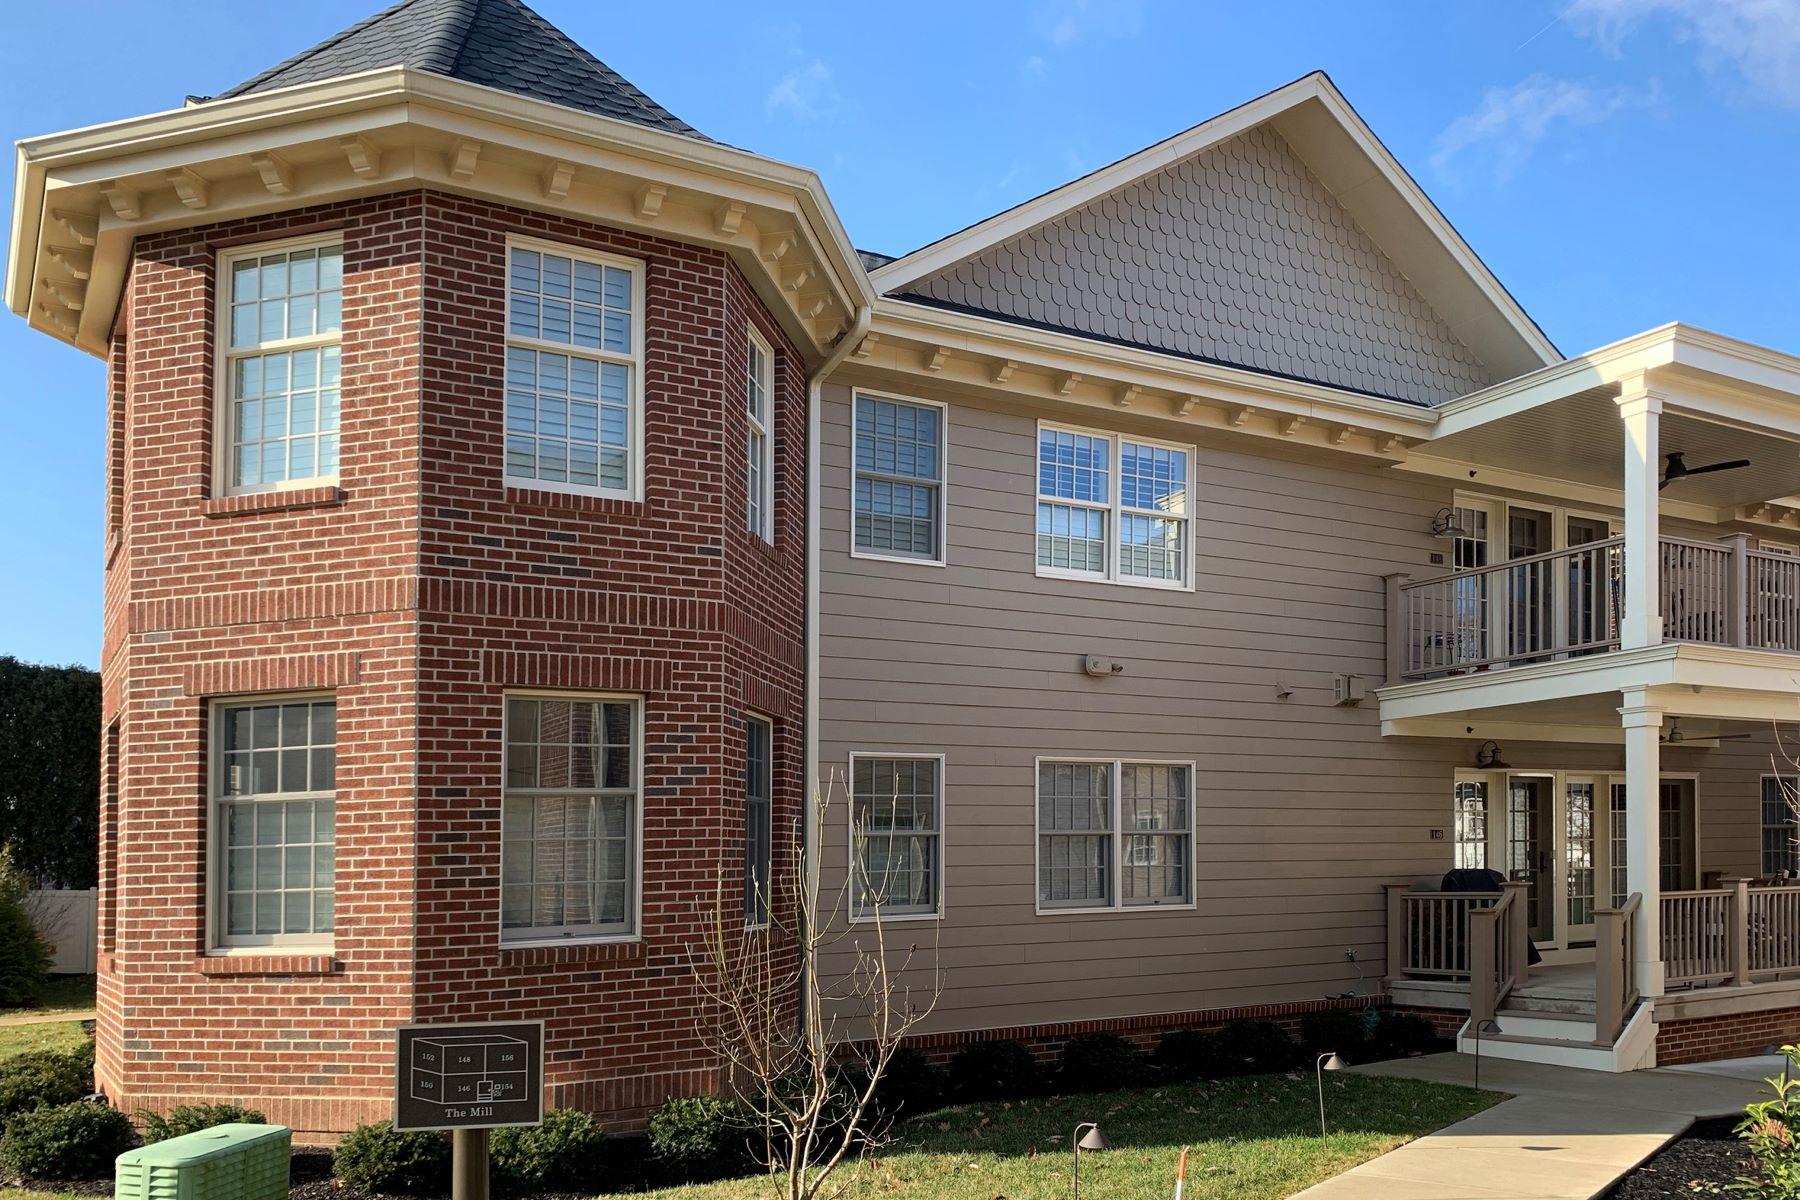 Condominiums for Sale at 146 N CLINTON ST Doylestown, Pennsylvania 18901 United States